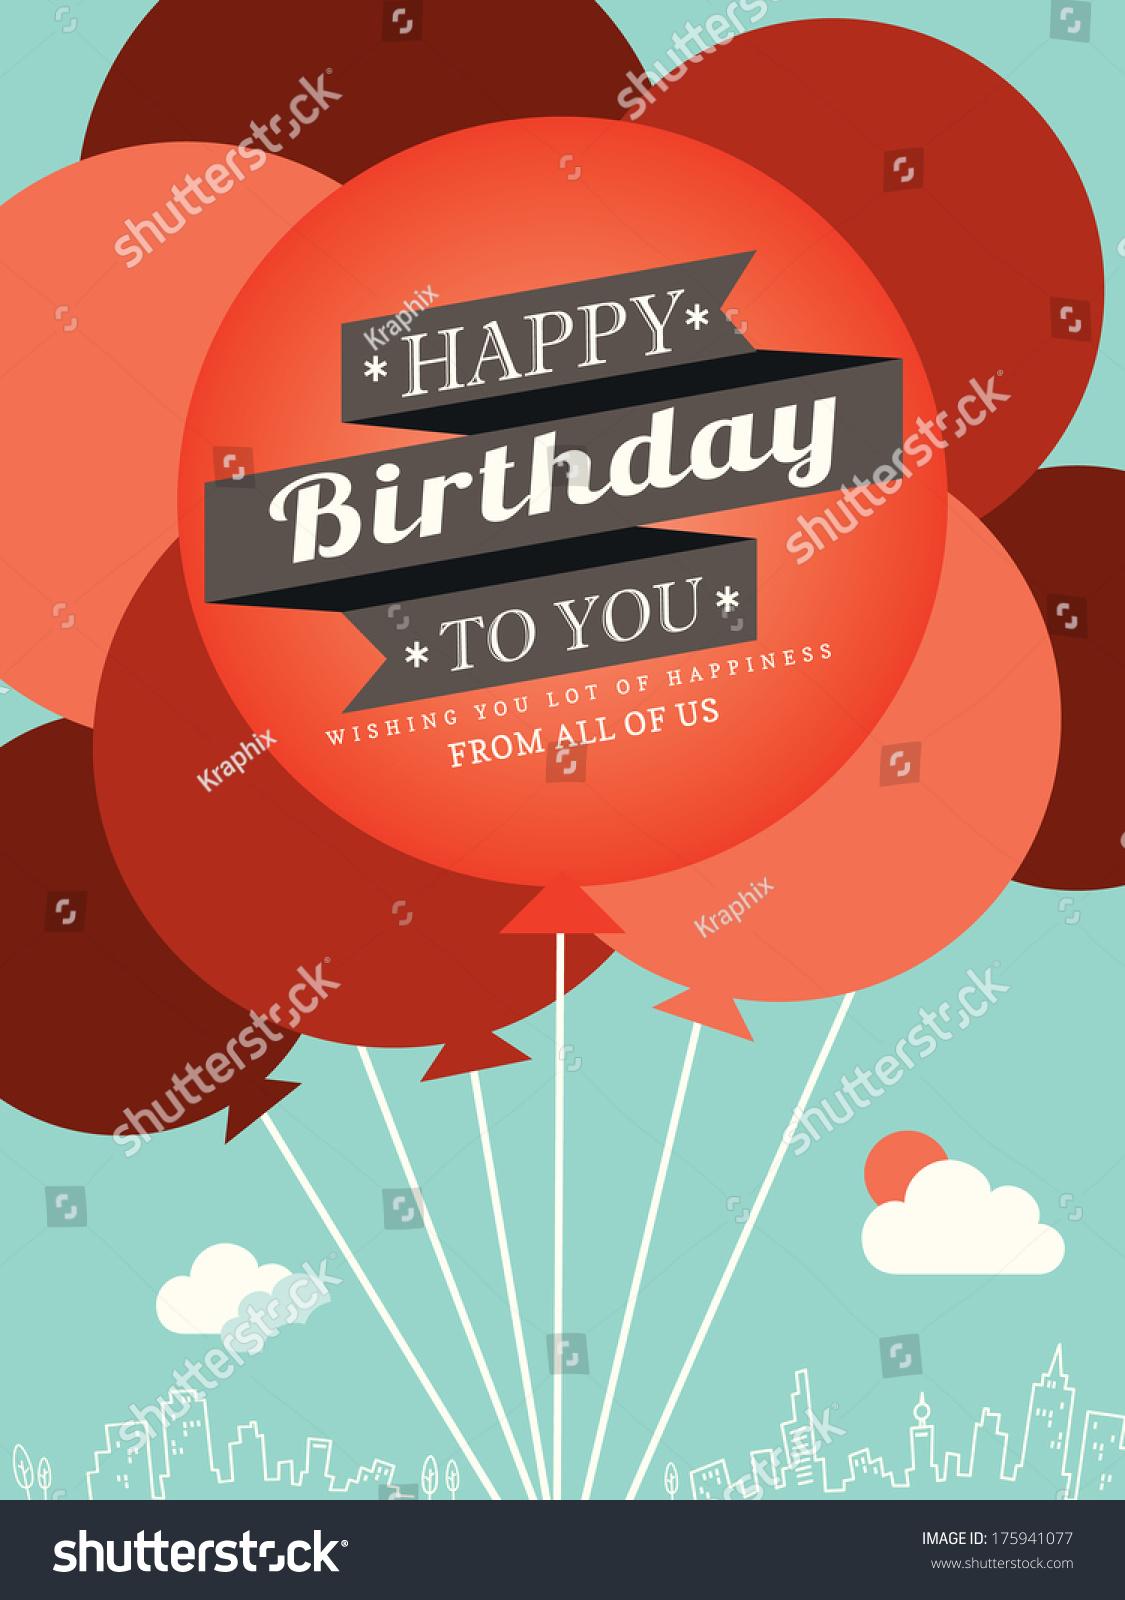 Happy Birthday Card Design Template Balloon Stock Vector Royalty Free 175941077